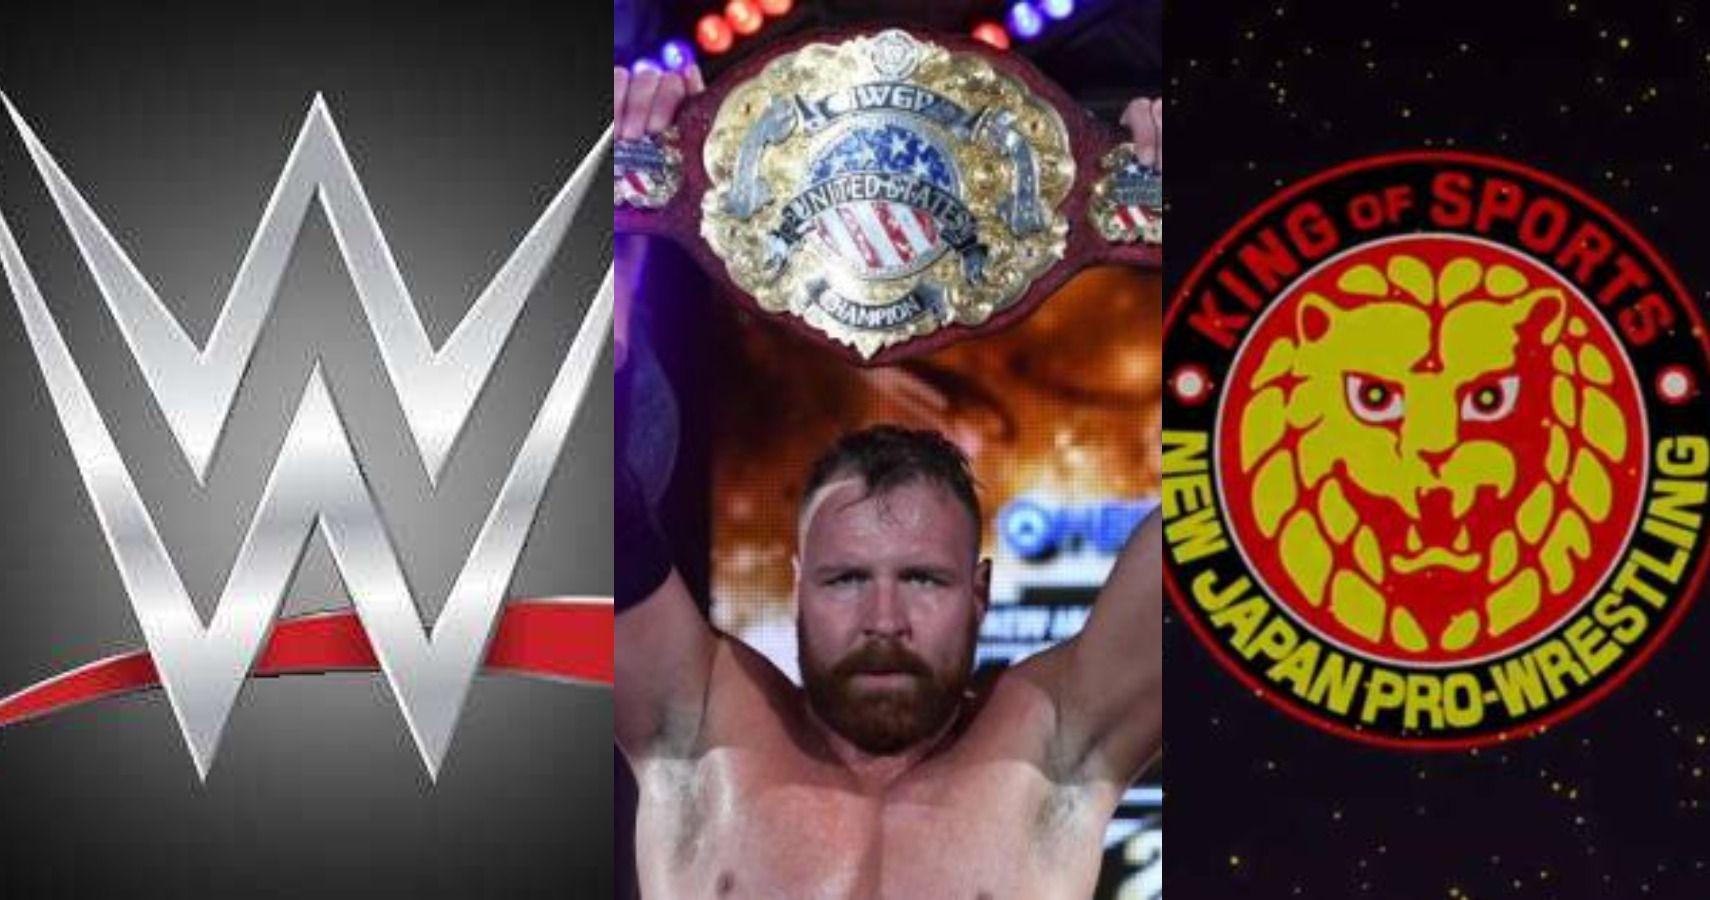 A WWE/NJPW Partnership Puts Jon Moxley In An Interesting Spot